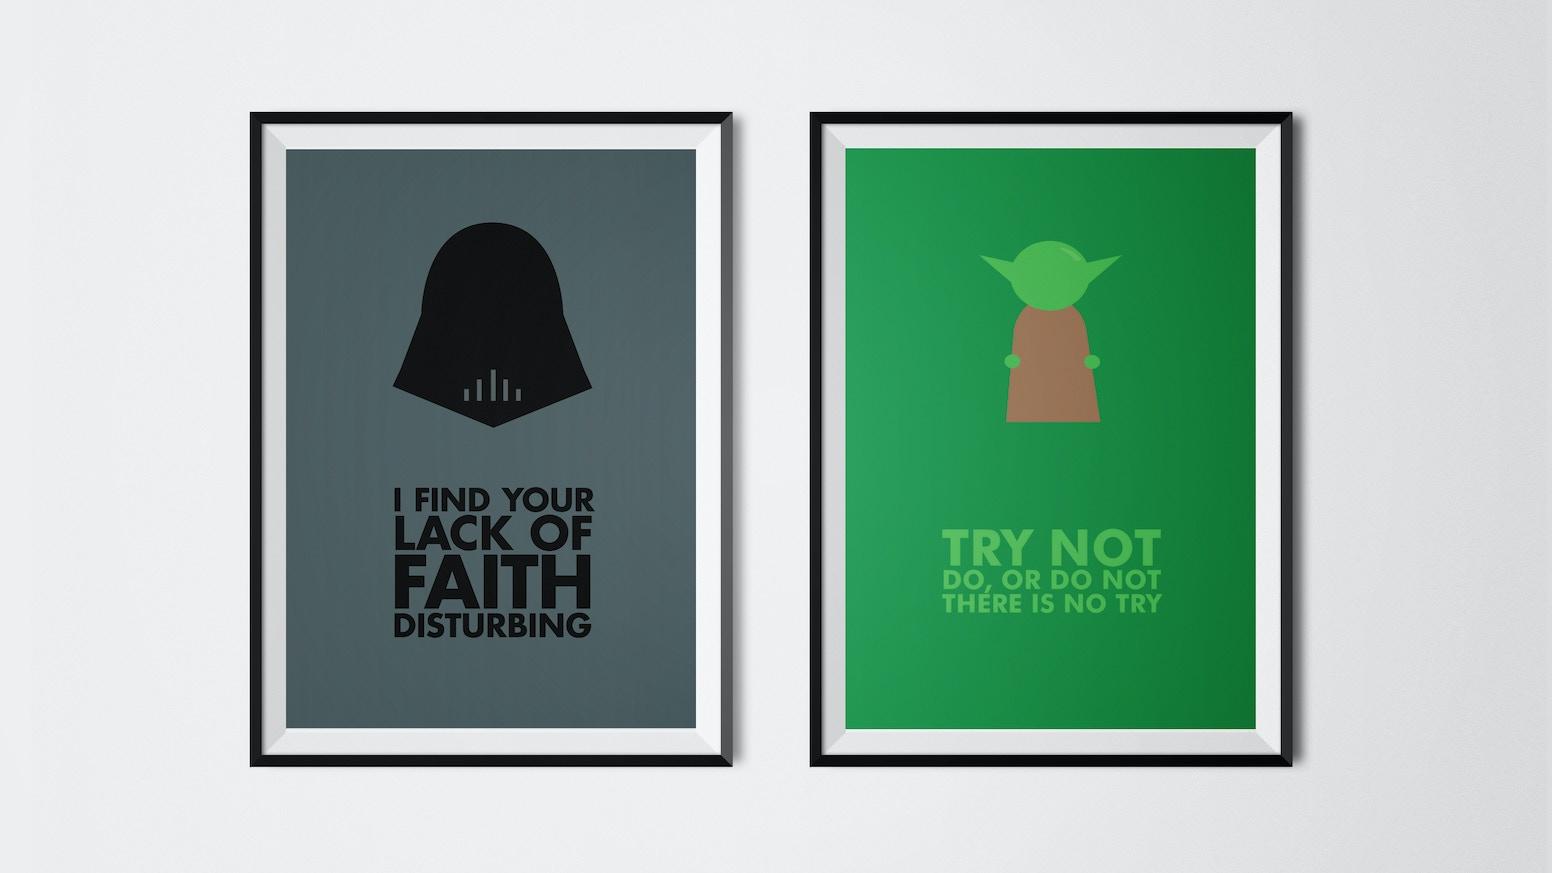 star wars minimal quote posters by thomas trunz petersen kickstarter